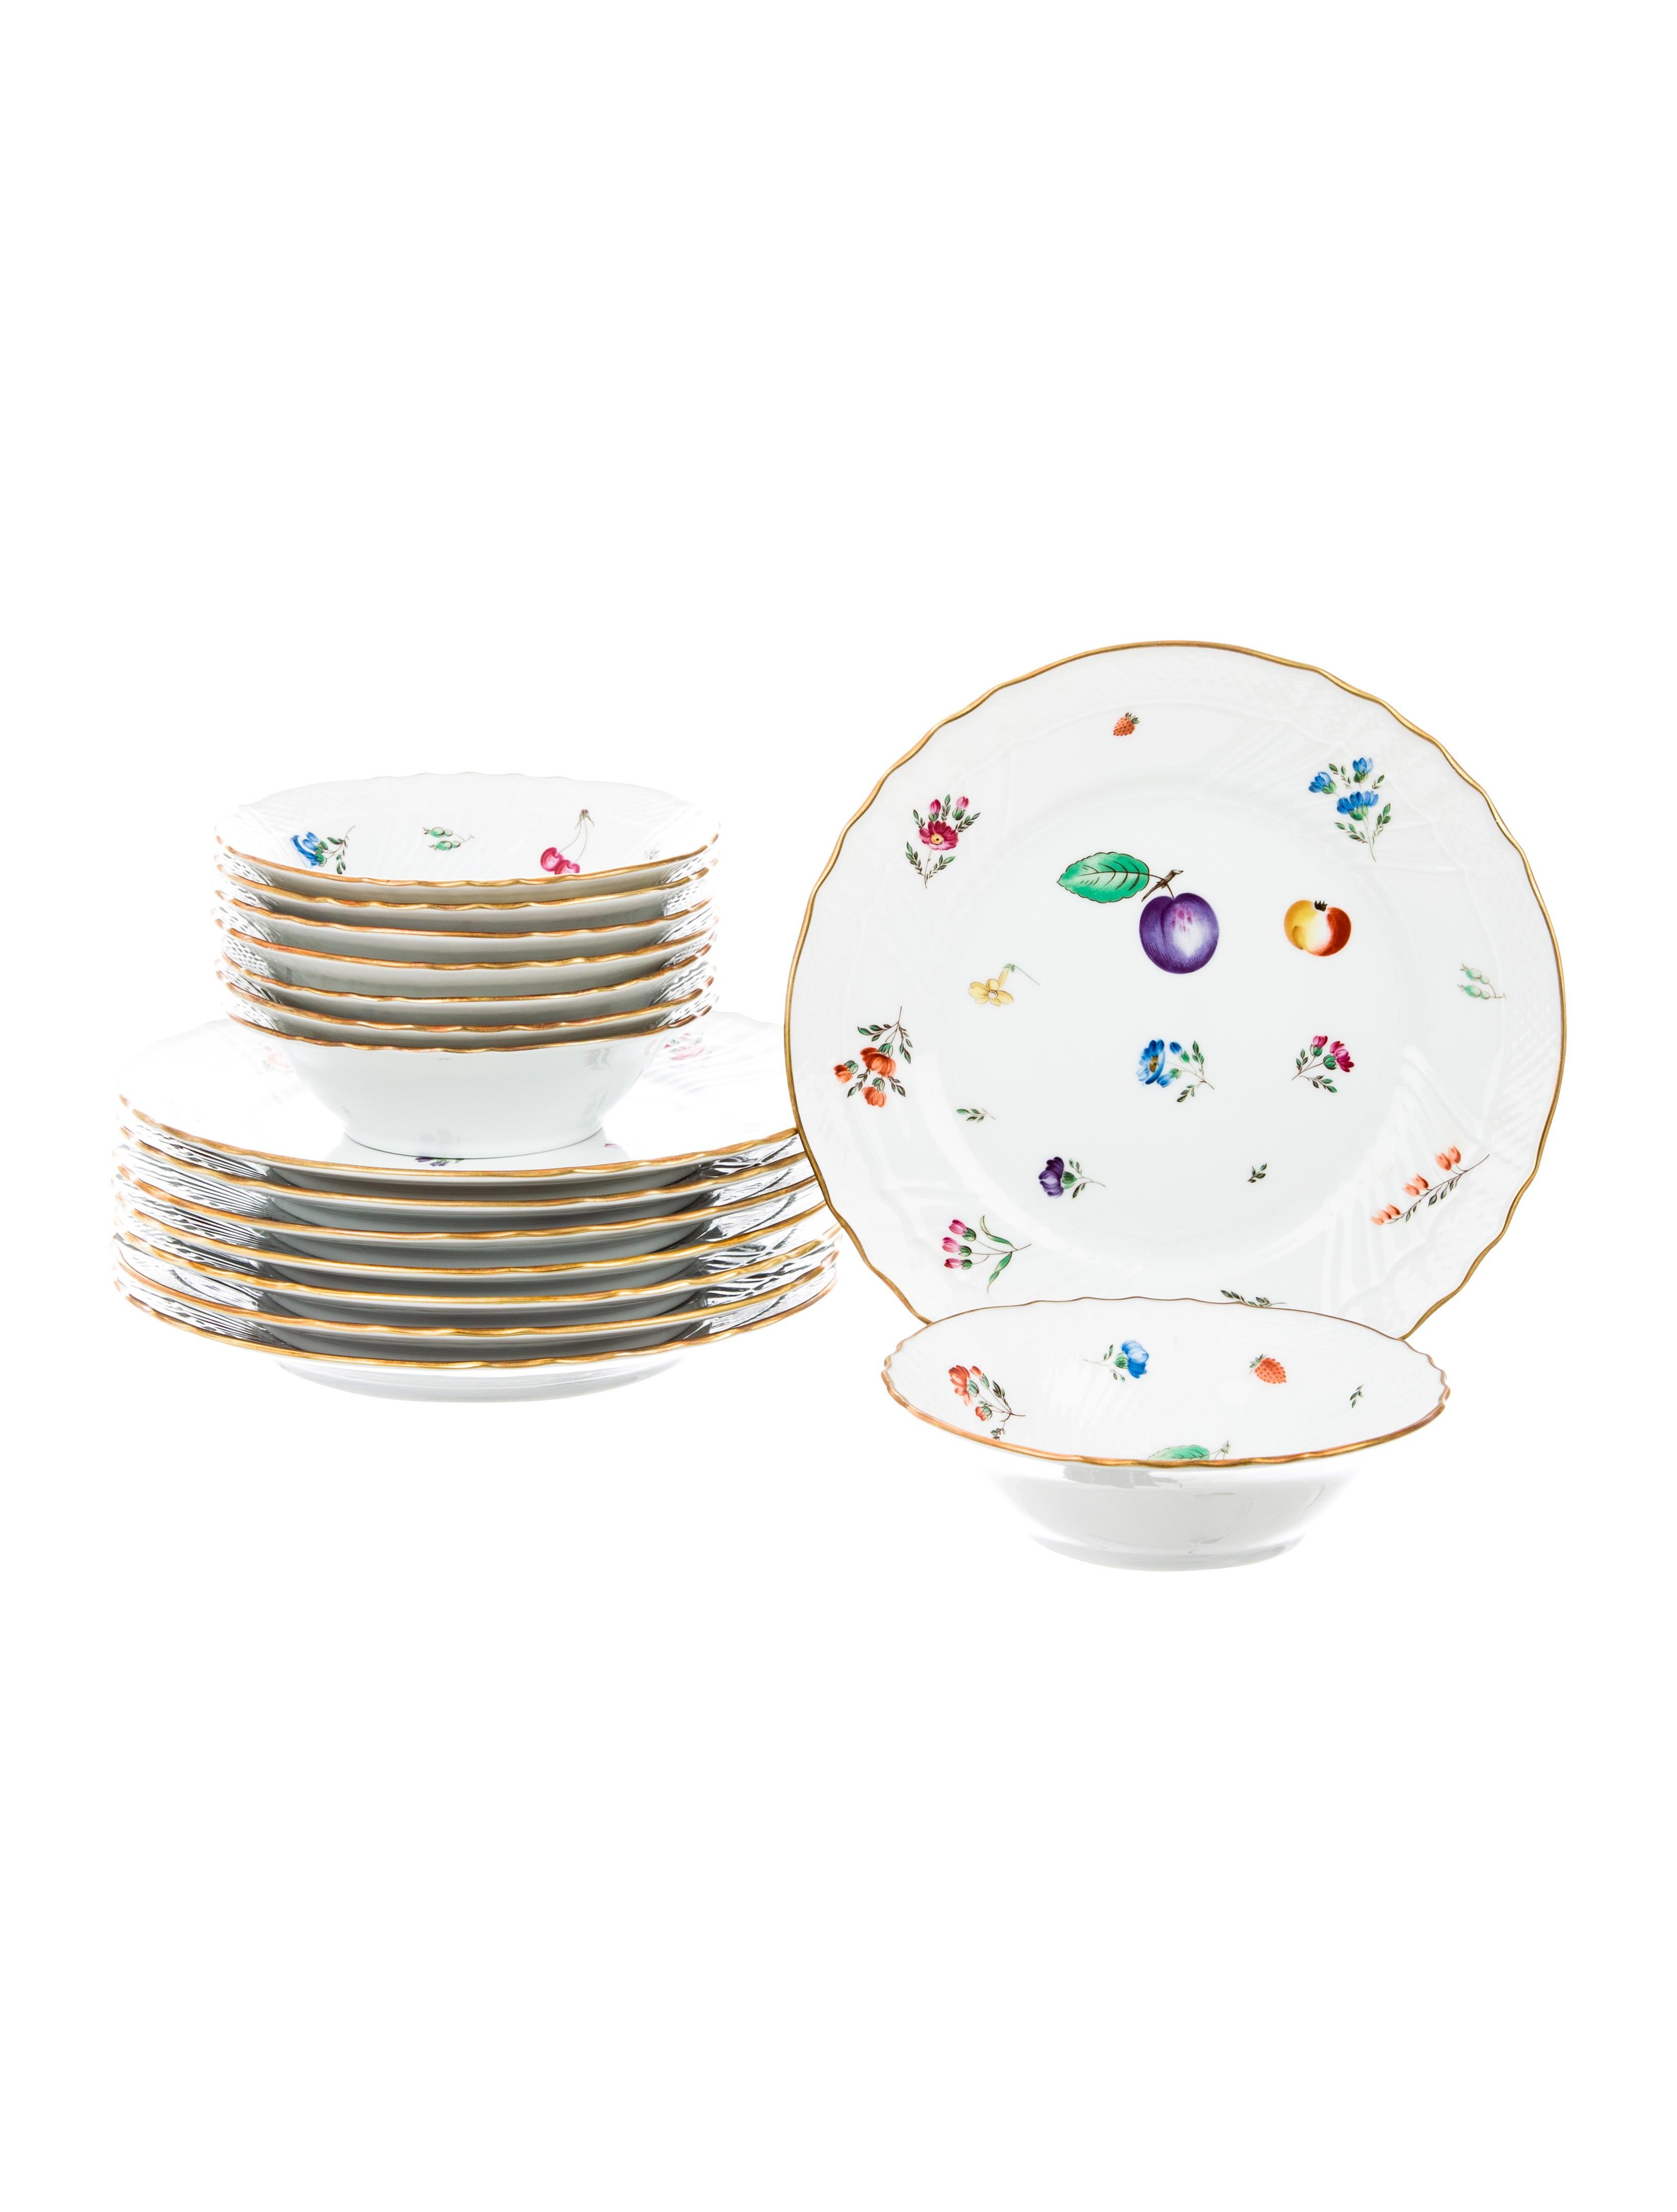 Richard ginori fruits bowls plates set tabletop and for Kitchen set plates